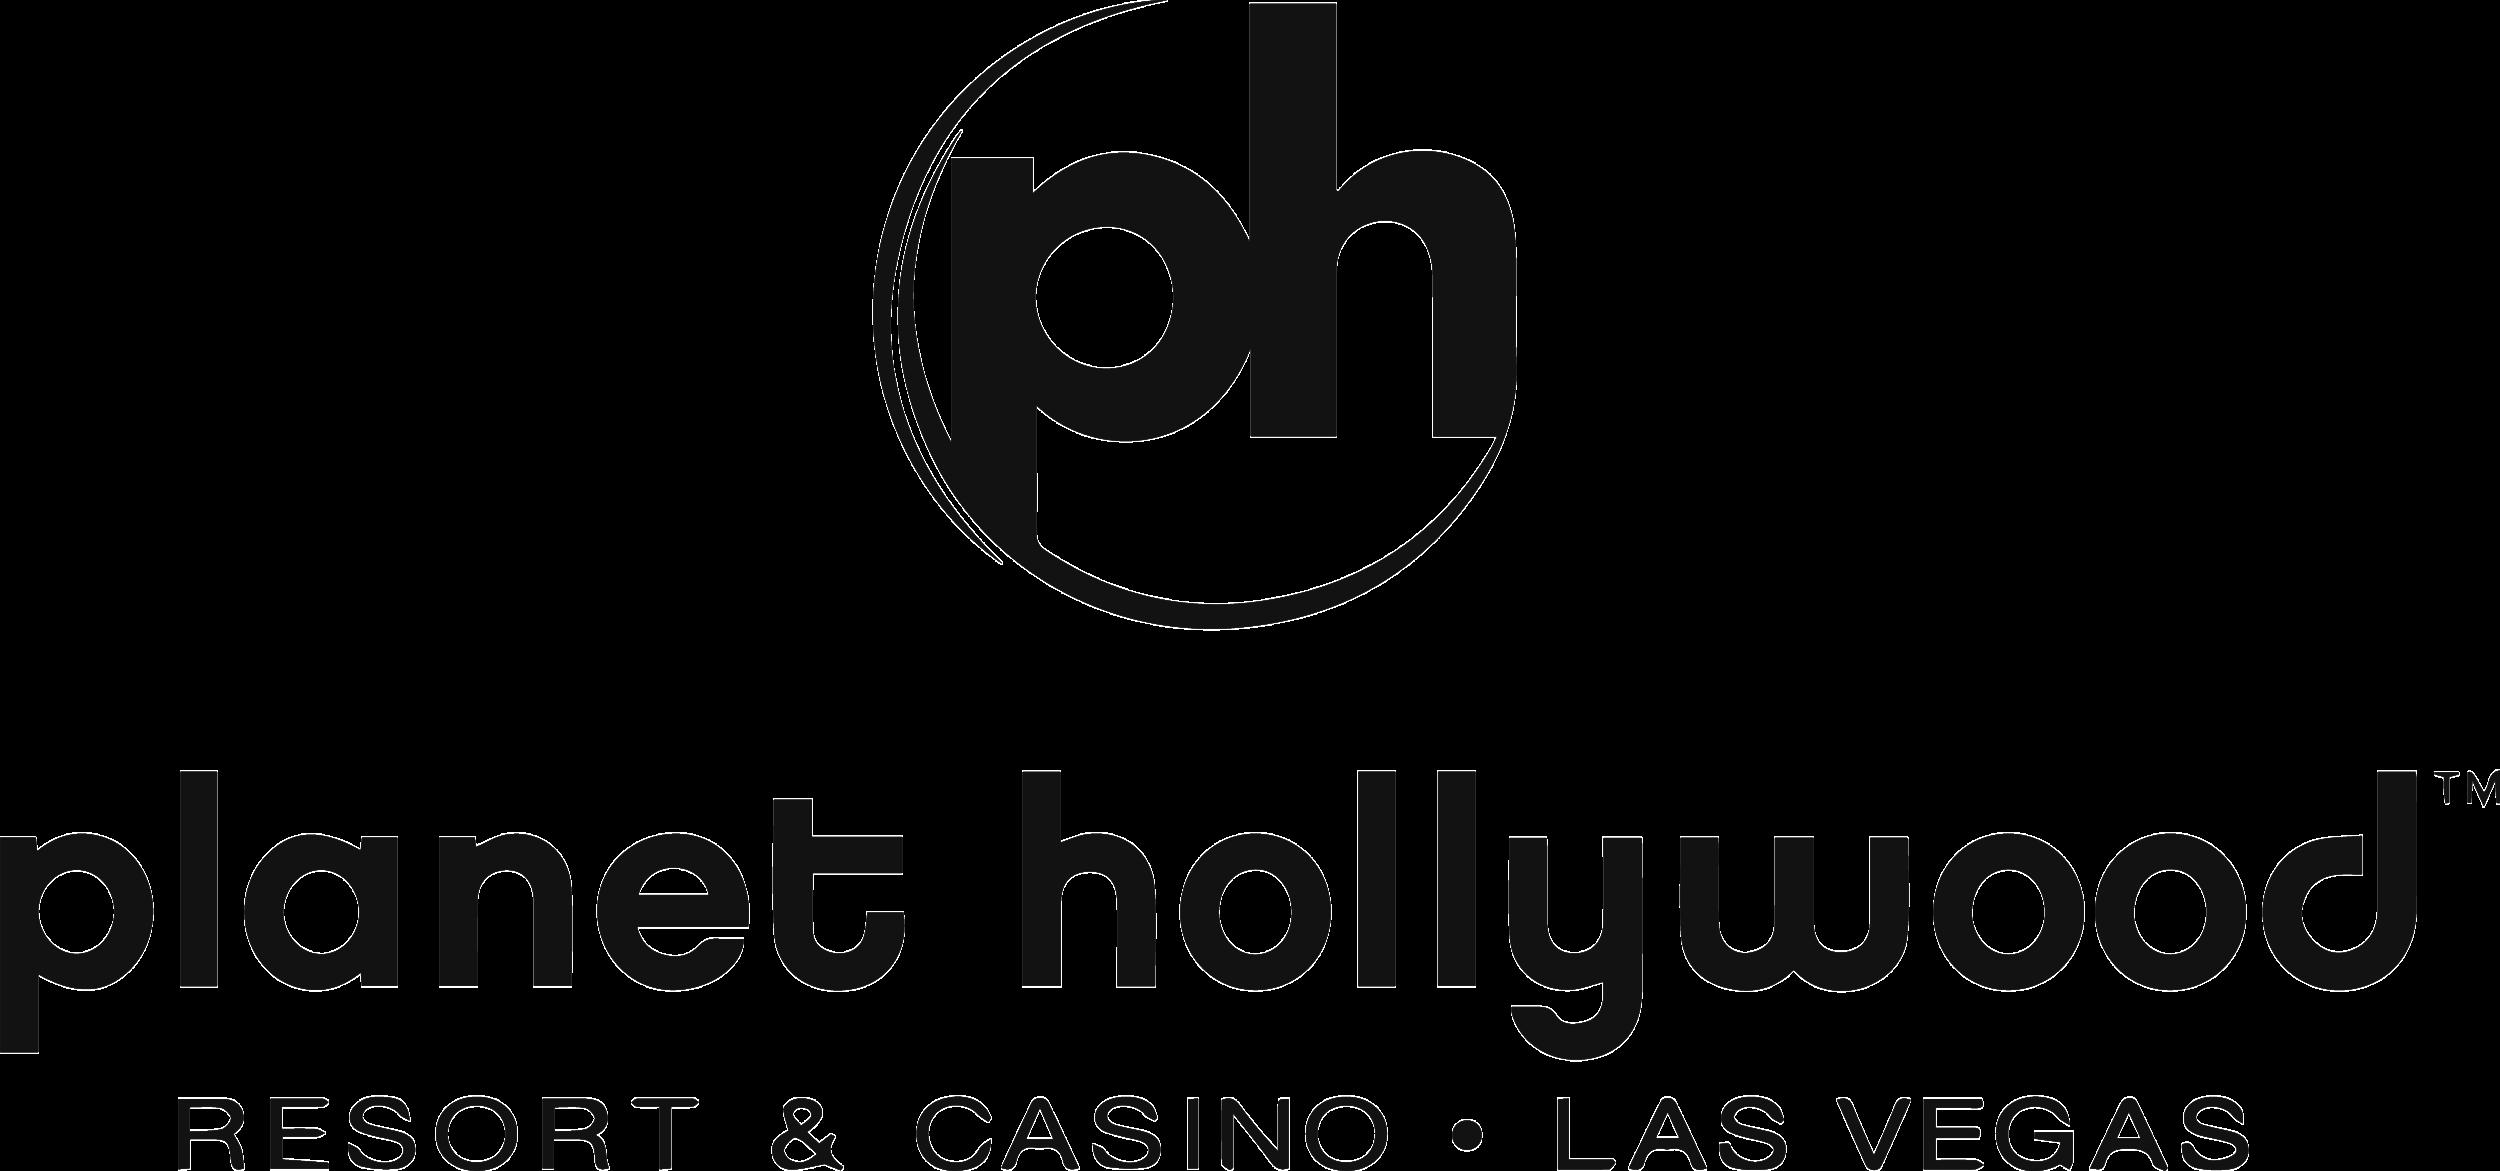 PlanetHollywoodLasVegas-logo.png